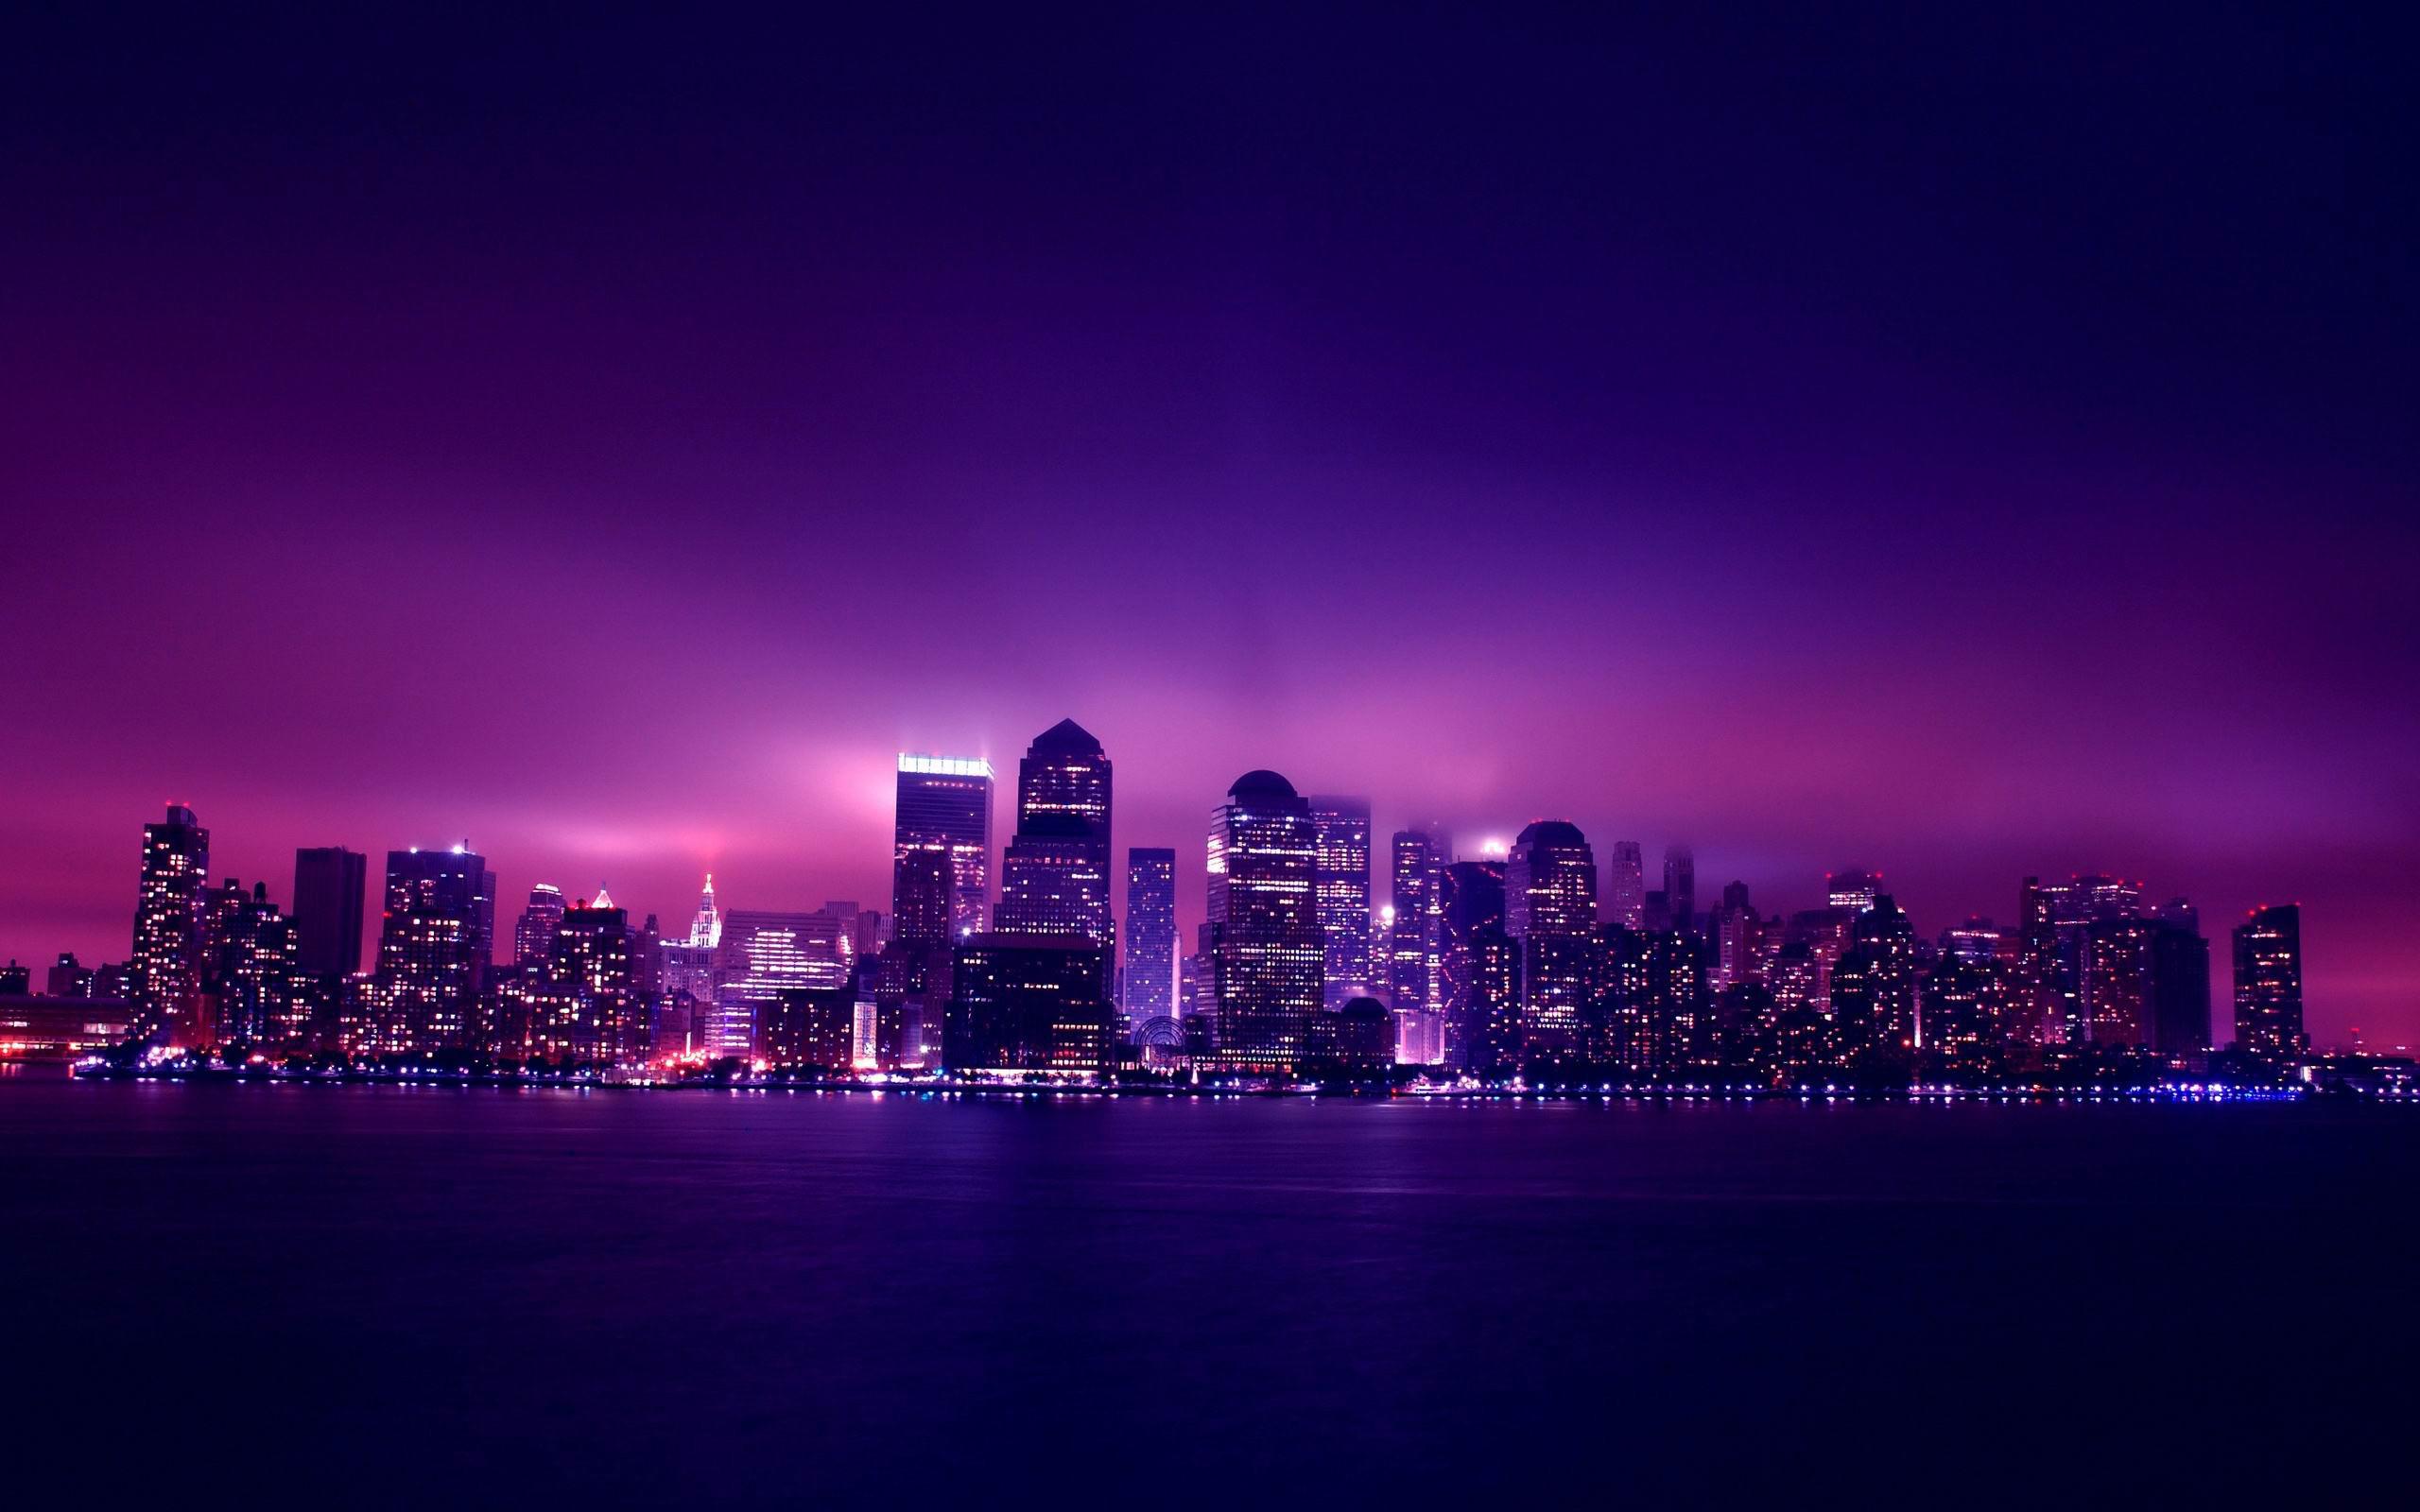 High Resolution New York Skyline Wallpaper HD 8 City Full Size .